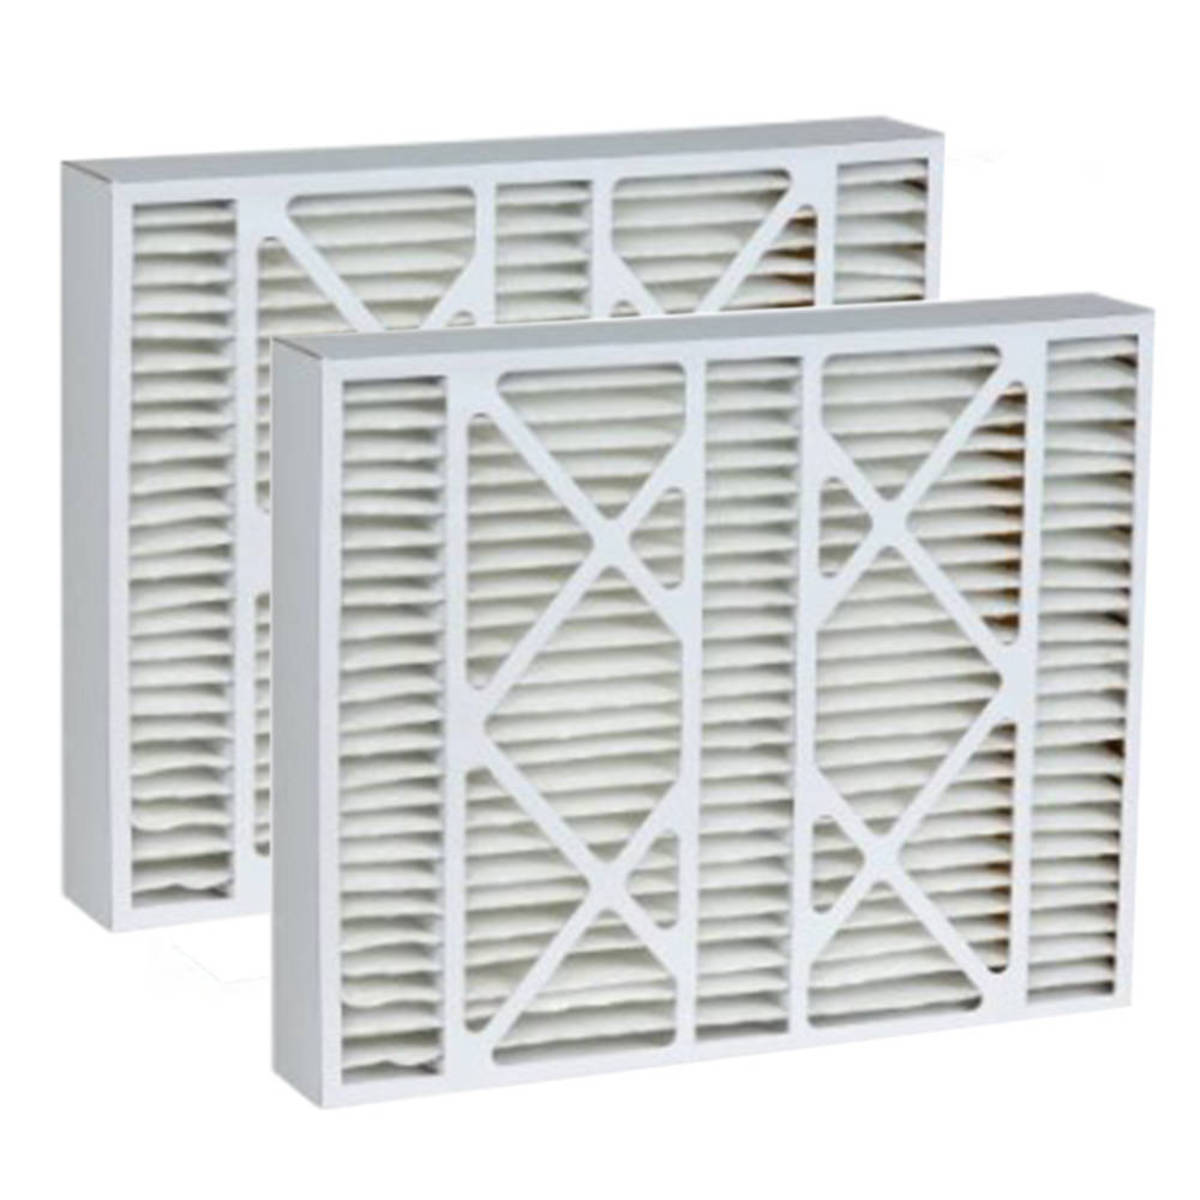 Lennox X0585 20x20x5 MERV 11 Comparable Air Filter - 2PK